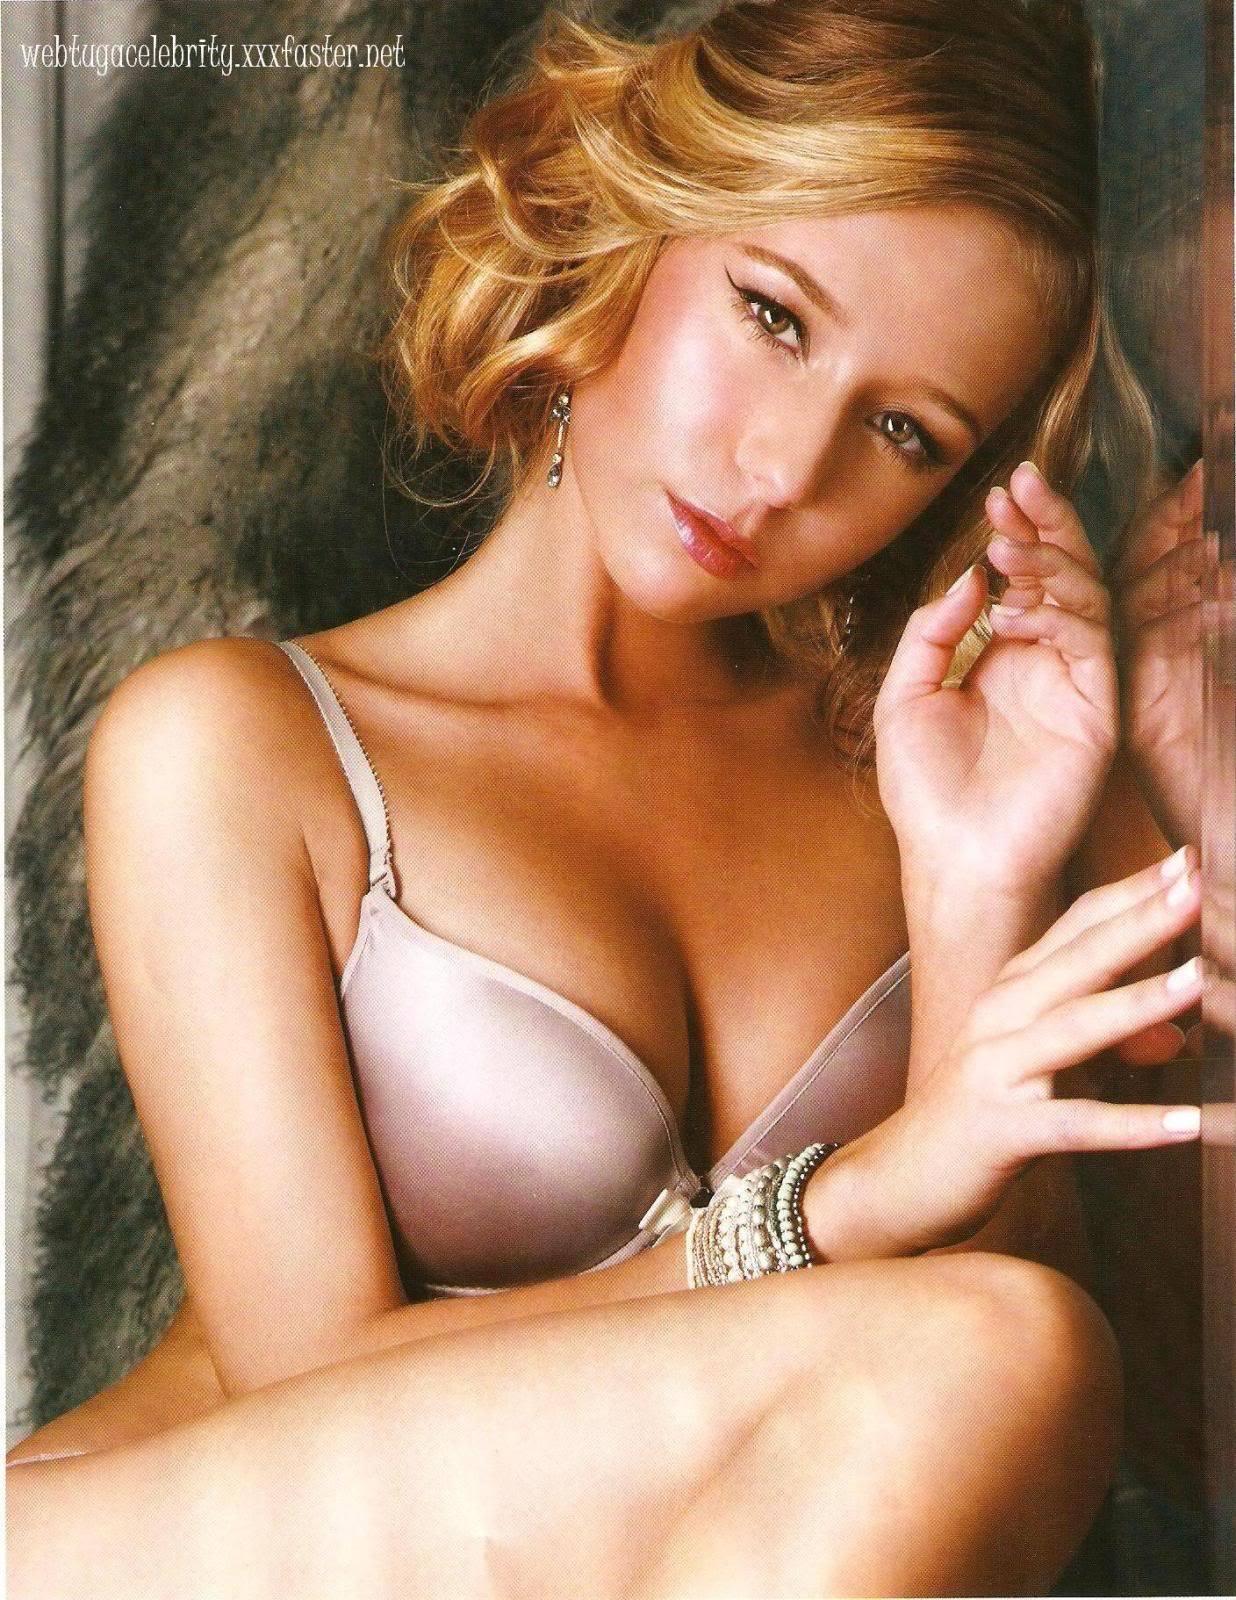 Sofia Arruda - MaxMen Scans - Sexy Actress Pictures   Hot Actress Pictures - ActressSnaps.com